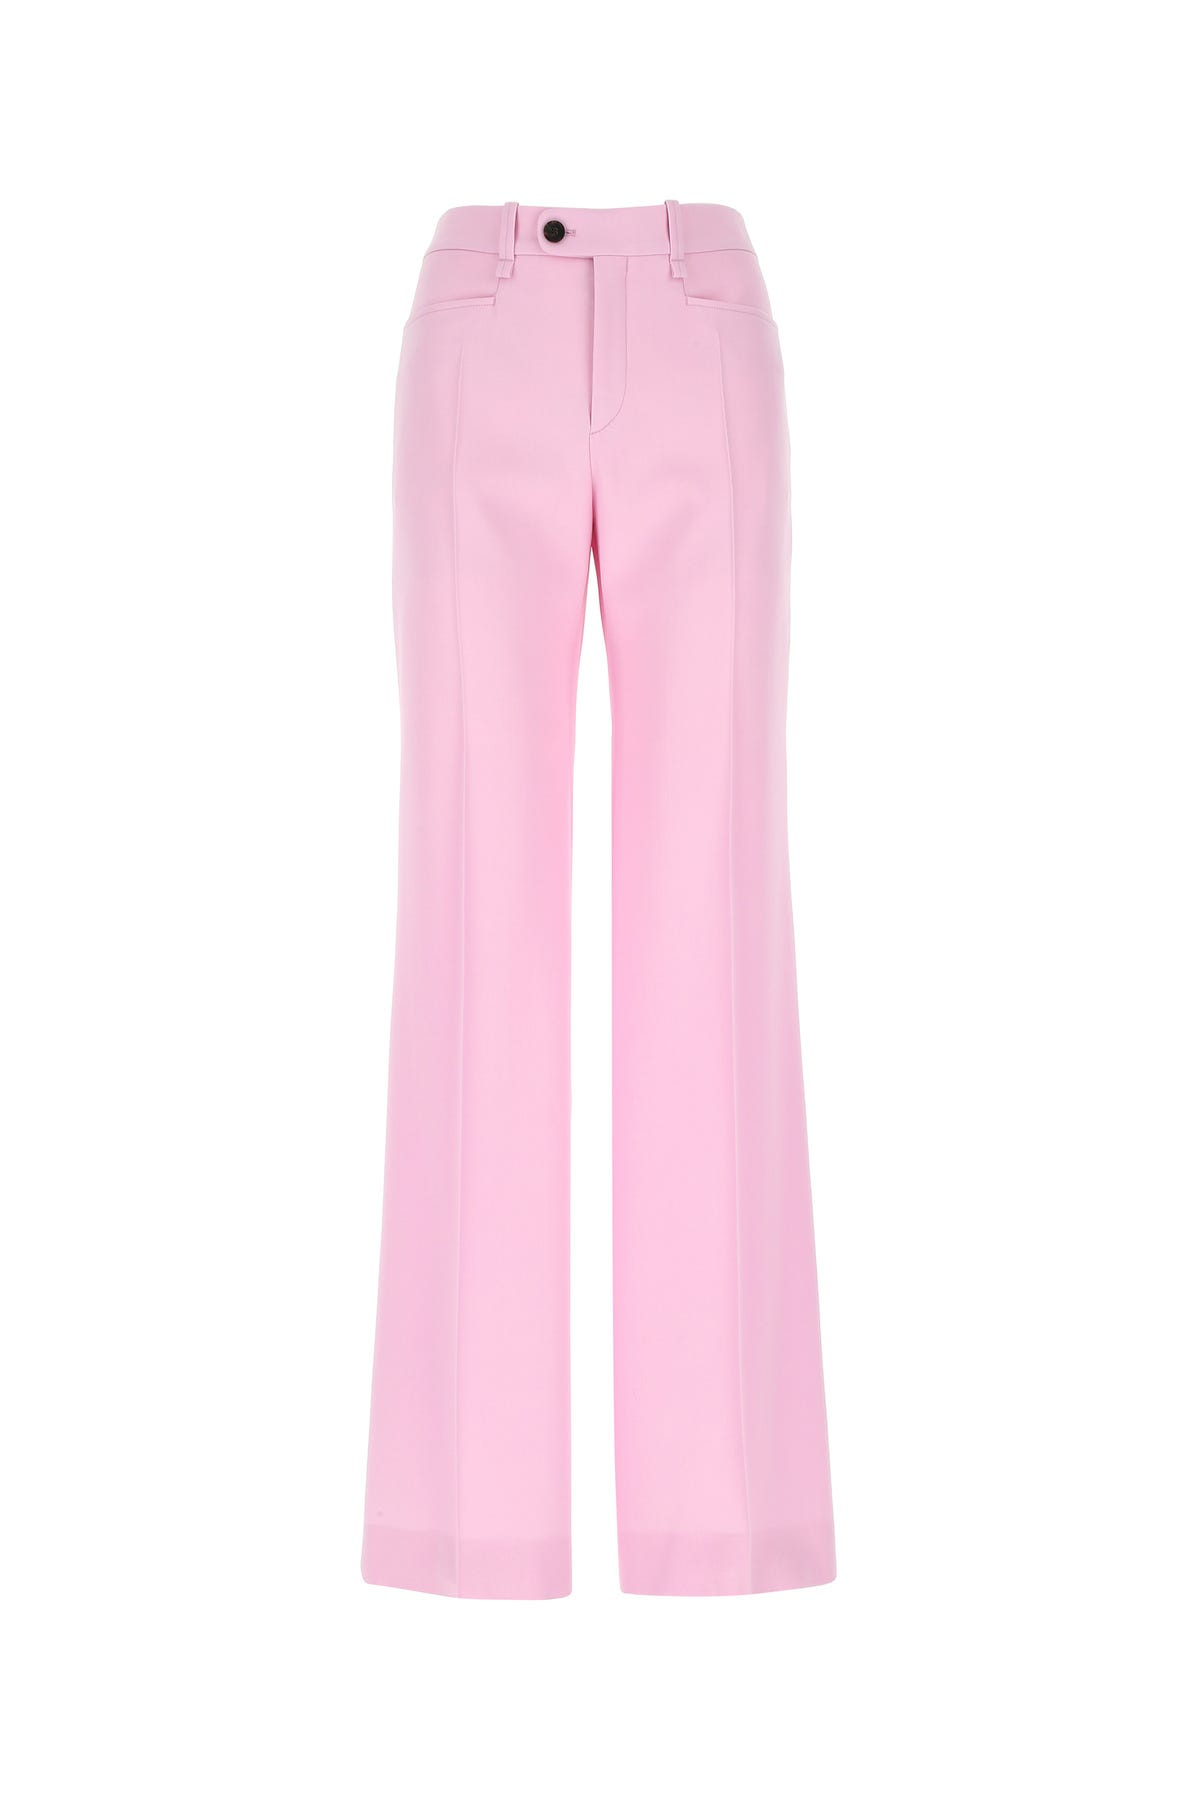 Chloé Caramel Wool Pant  Nd Chloe Donna 38f In Pink